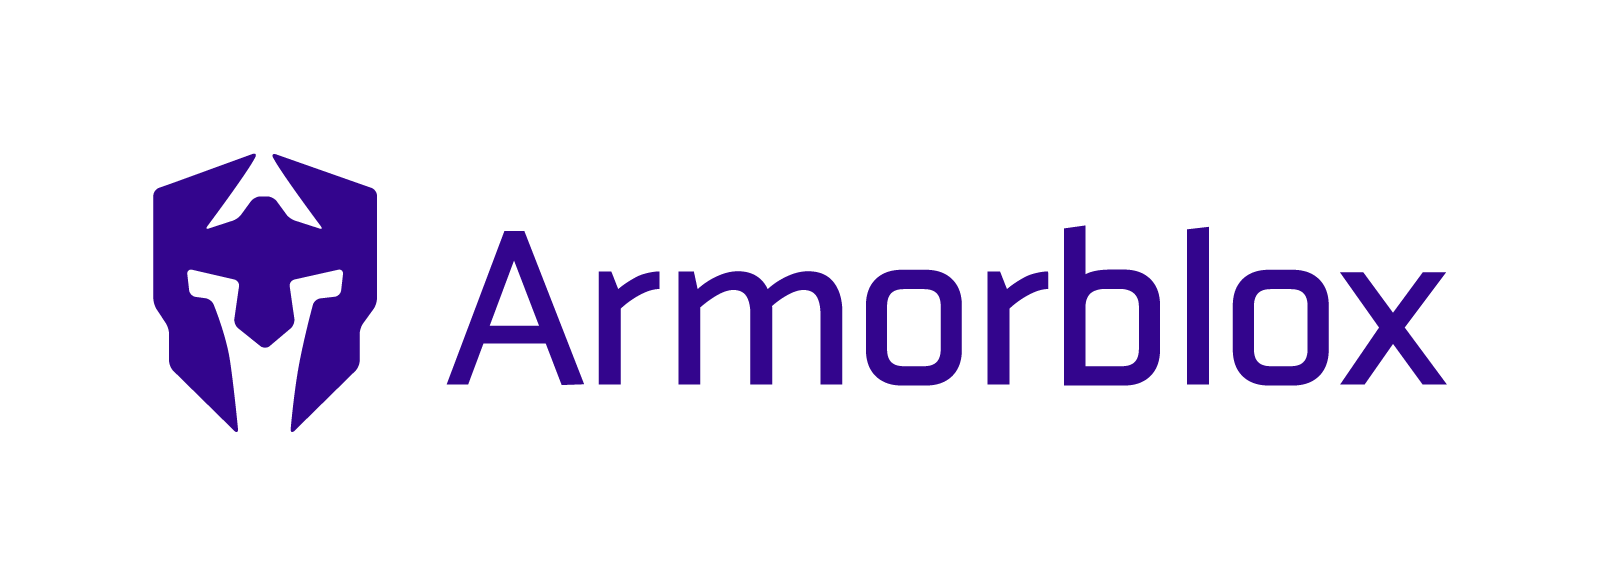 Armorblox logo